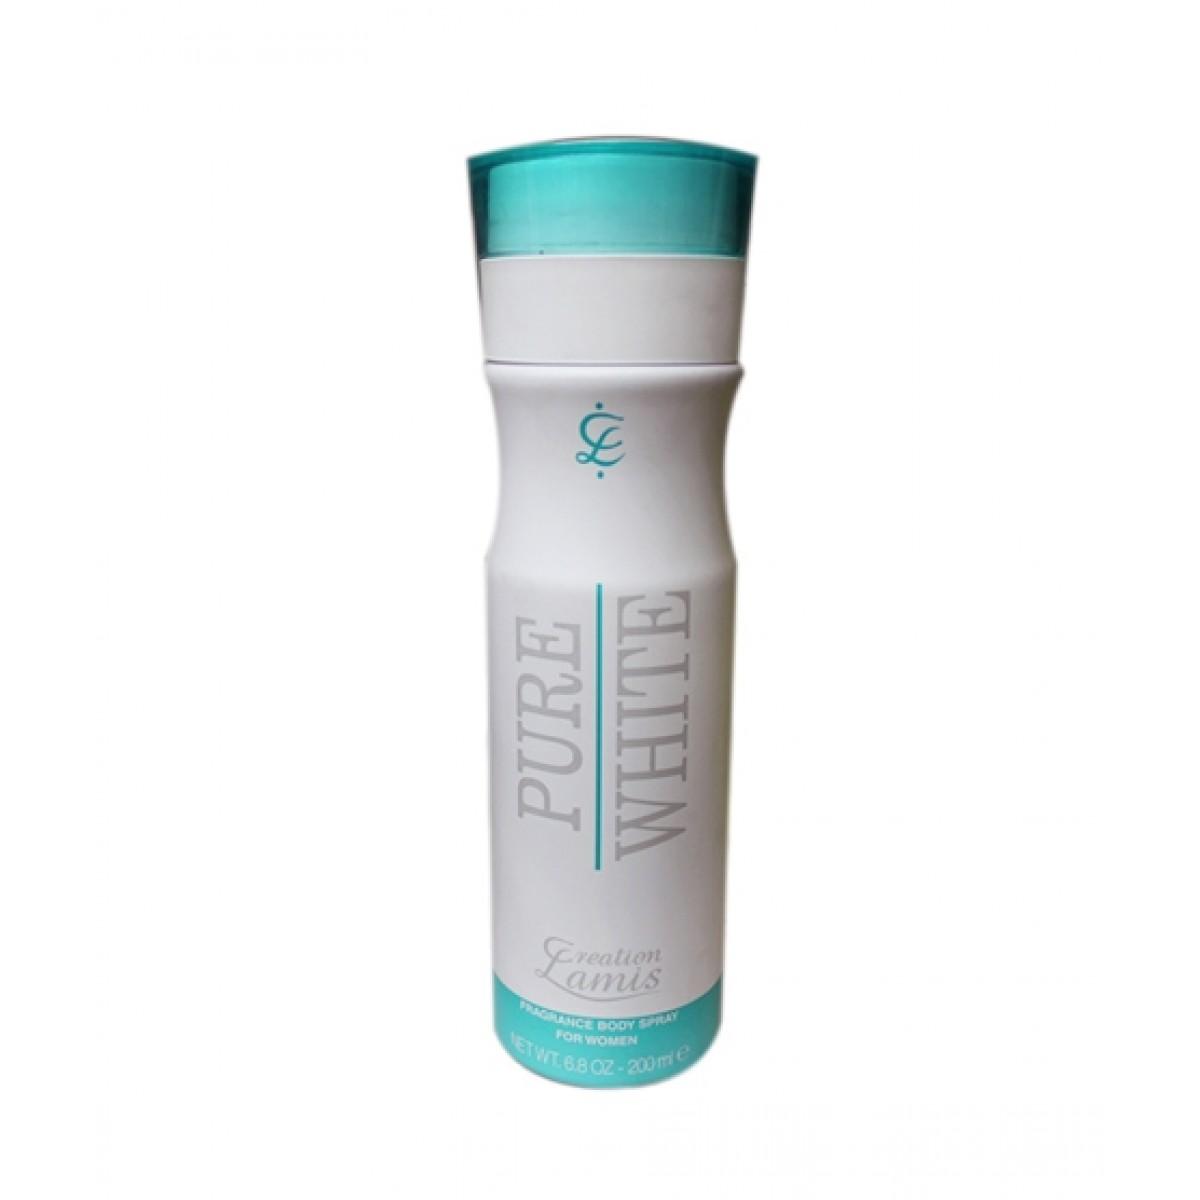 Creation Lamis Pure White Body Spray For Women 200ml